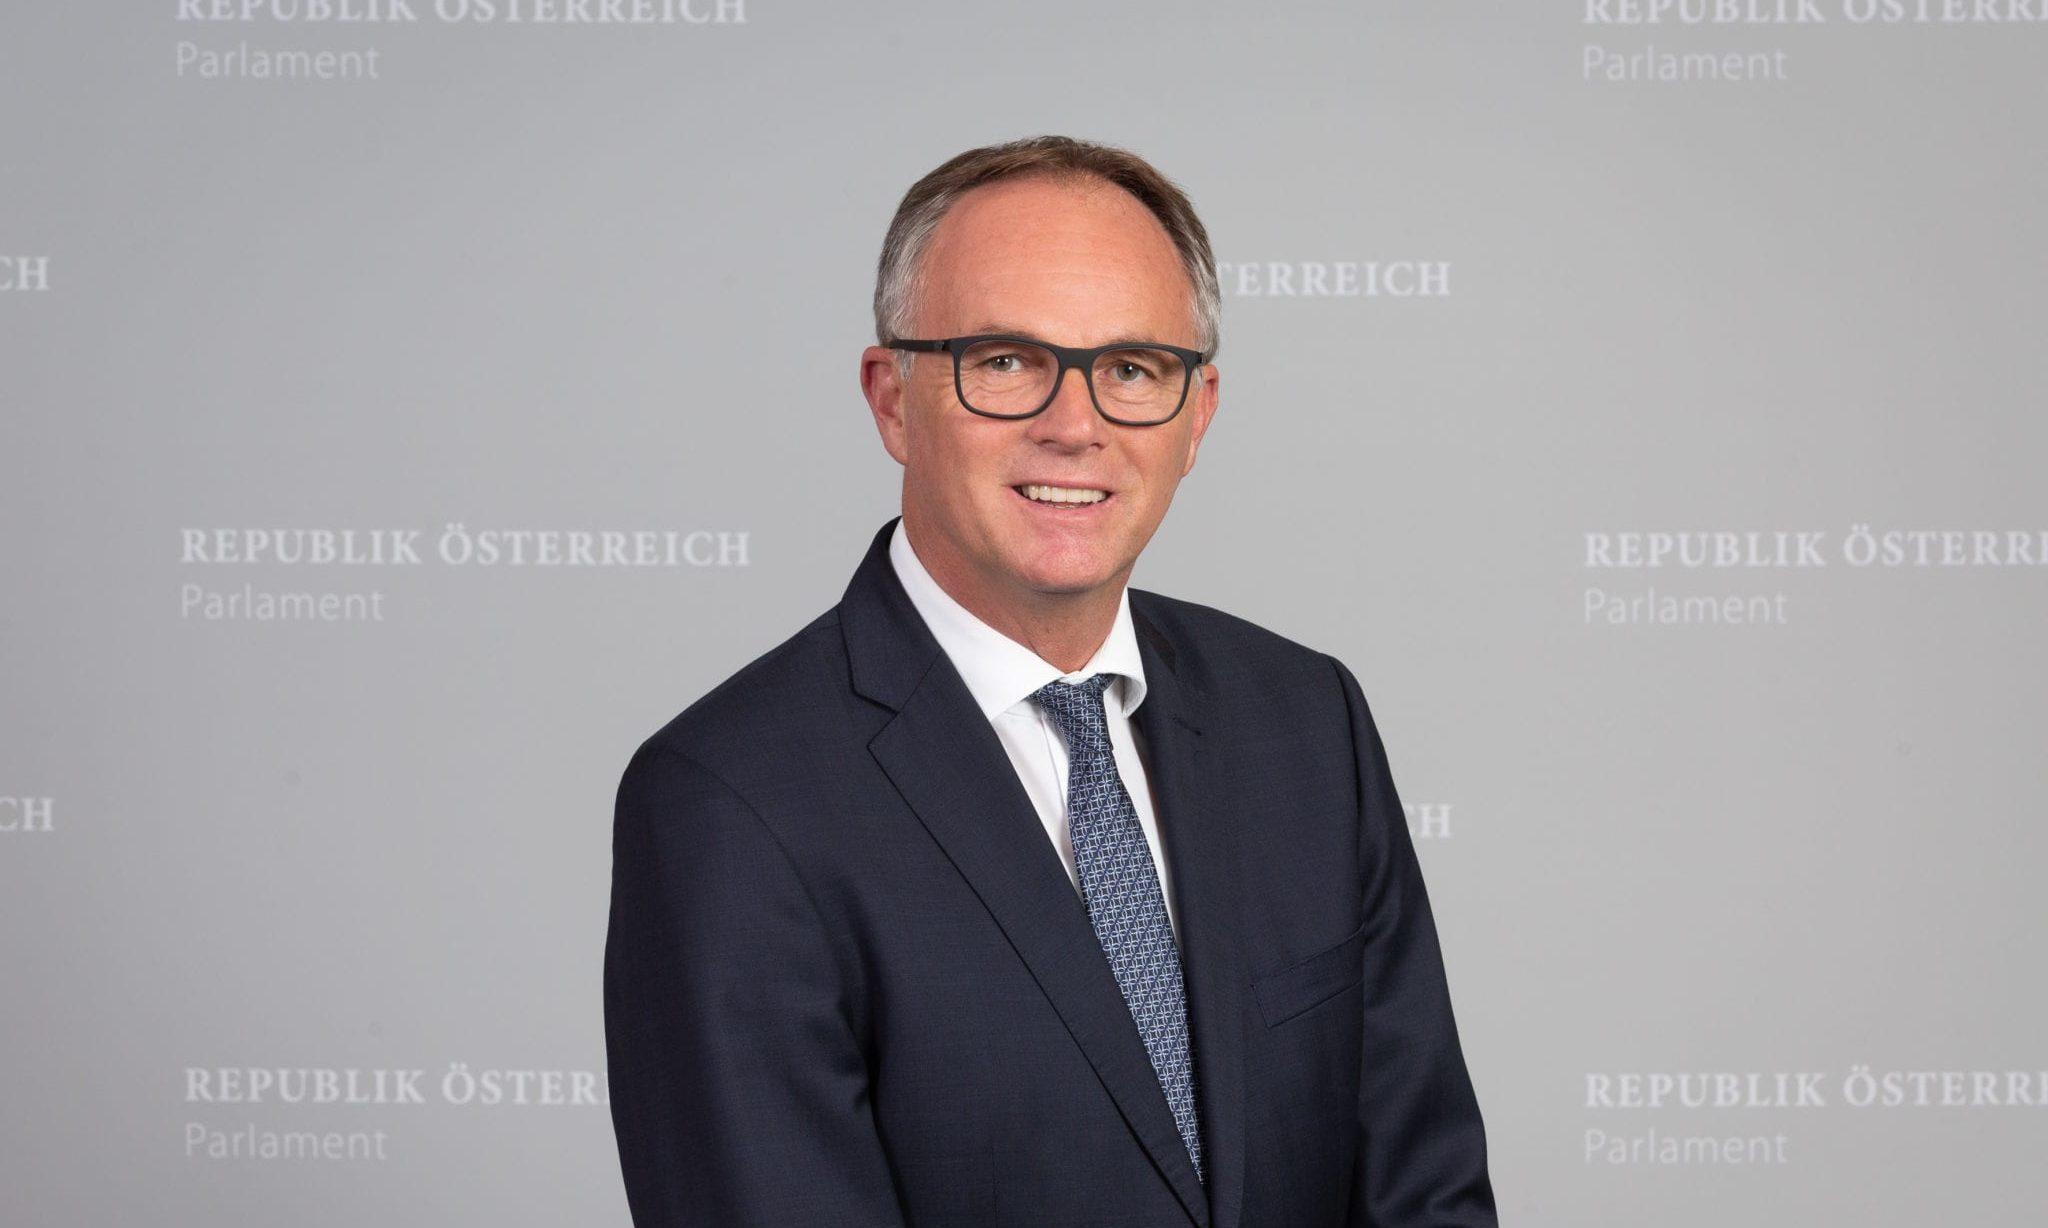 Karl Schmidhofer